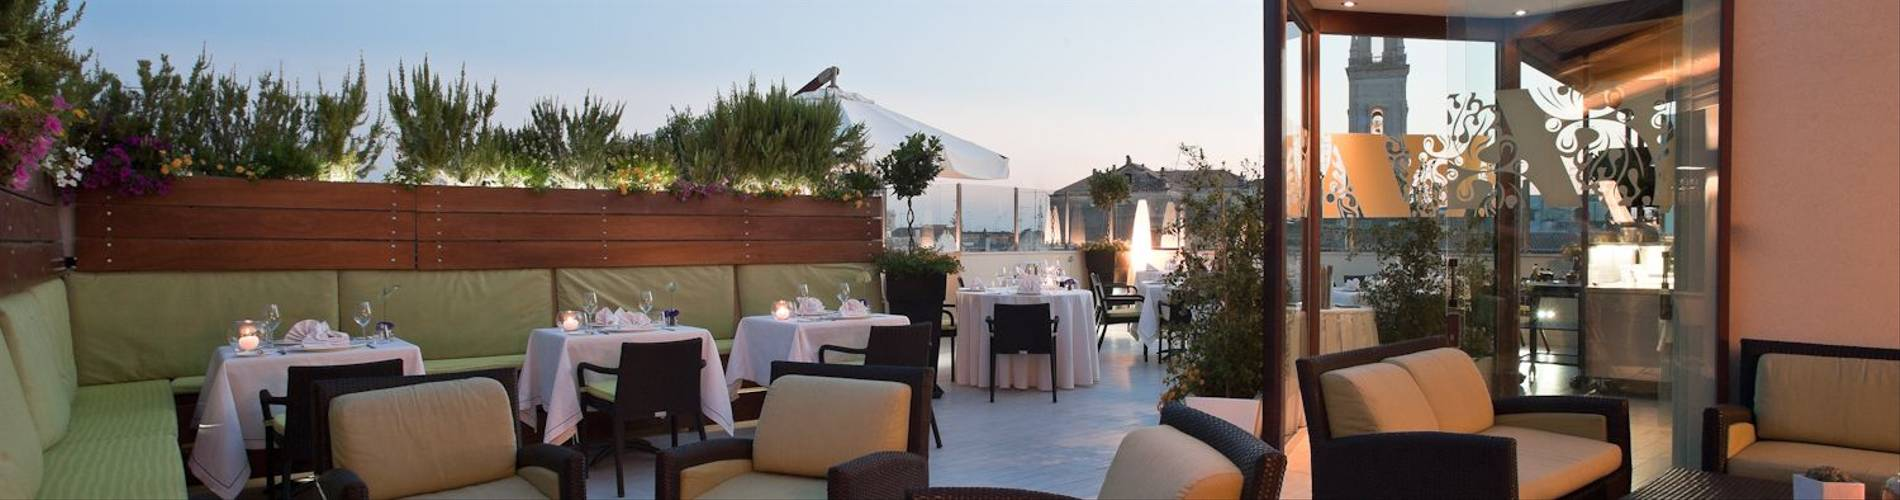 Risorgimento Resort 8.jpg